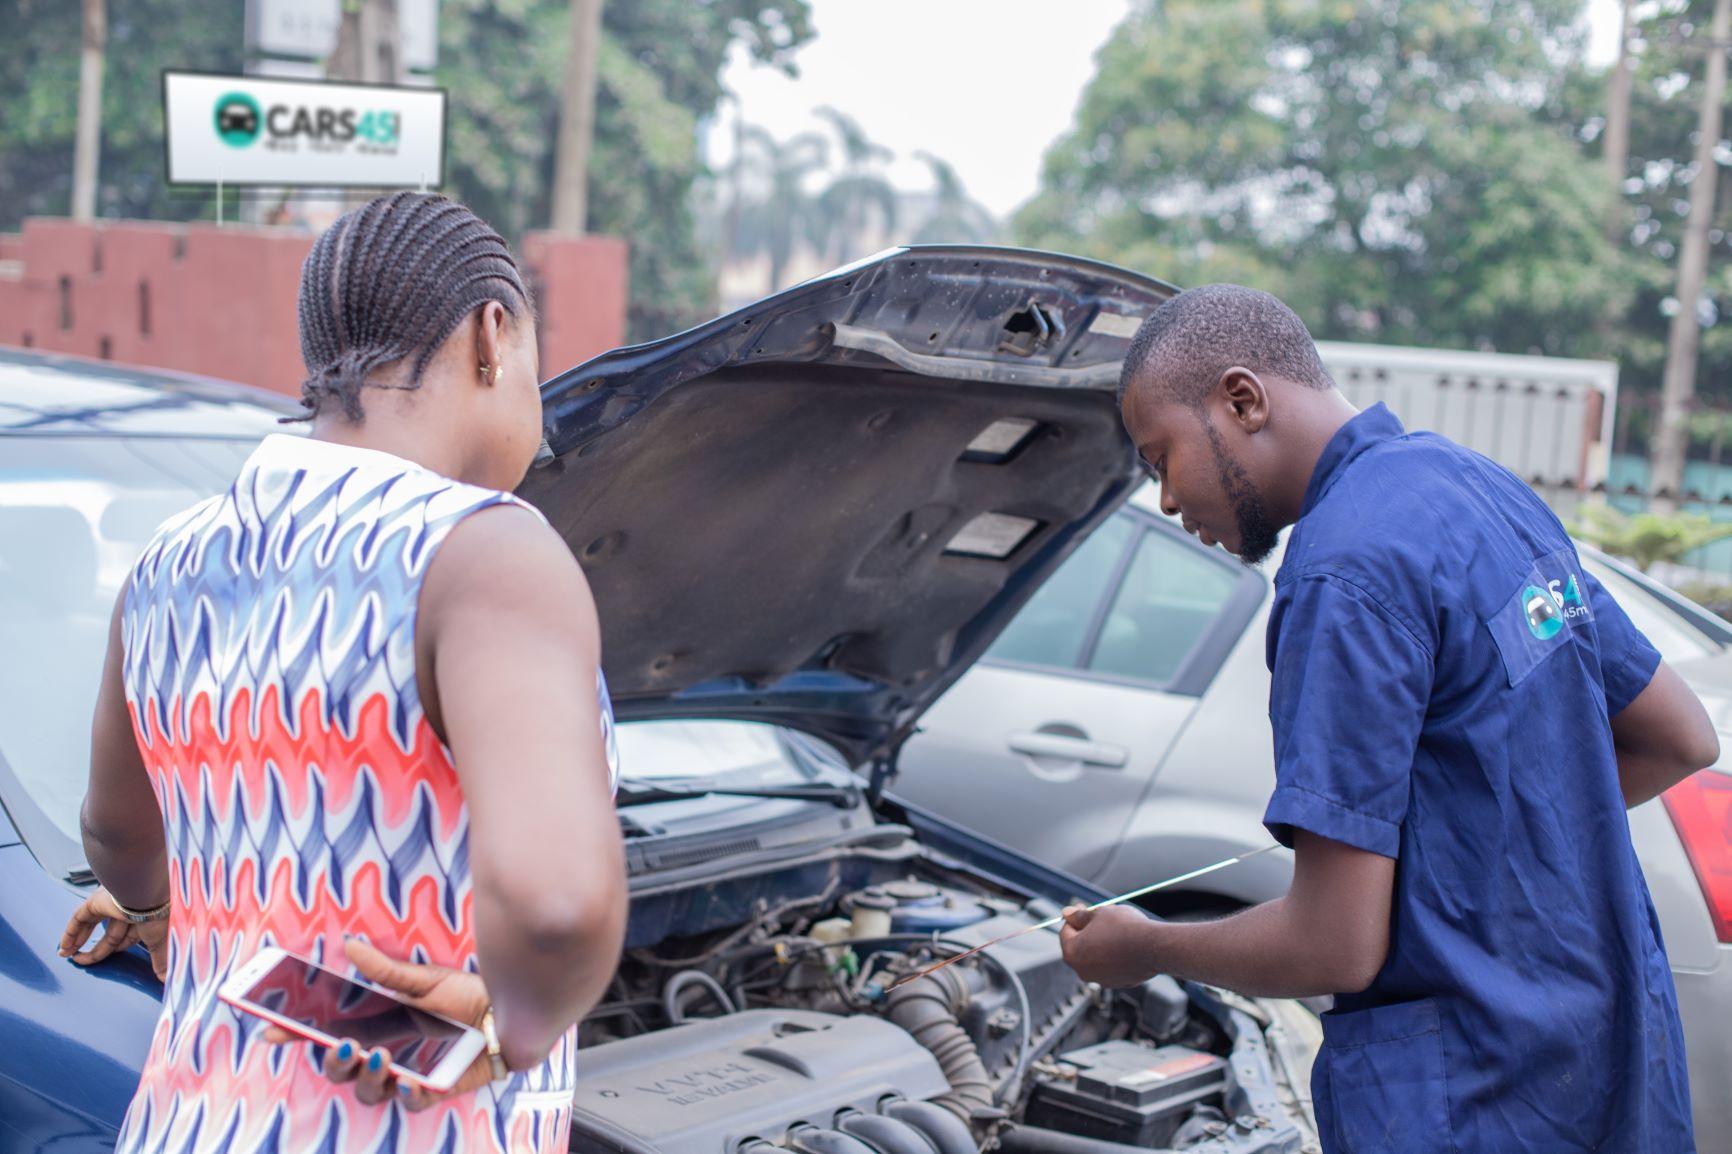 Cars 45 Expands To Ghana, Kenya — Ceo